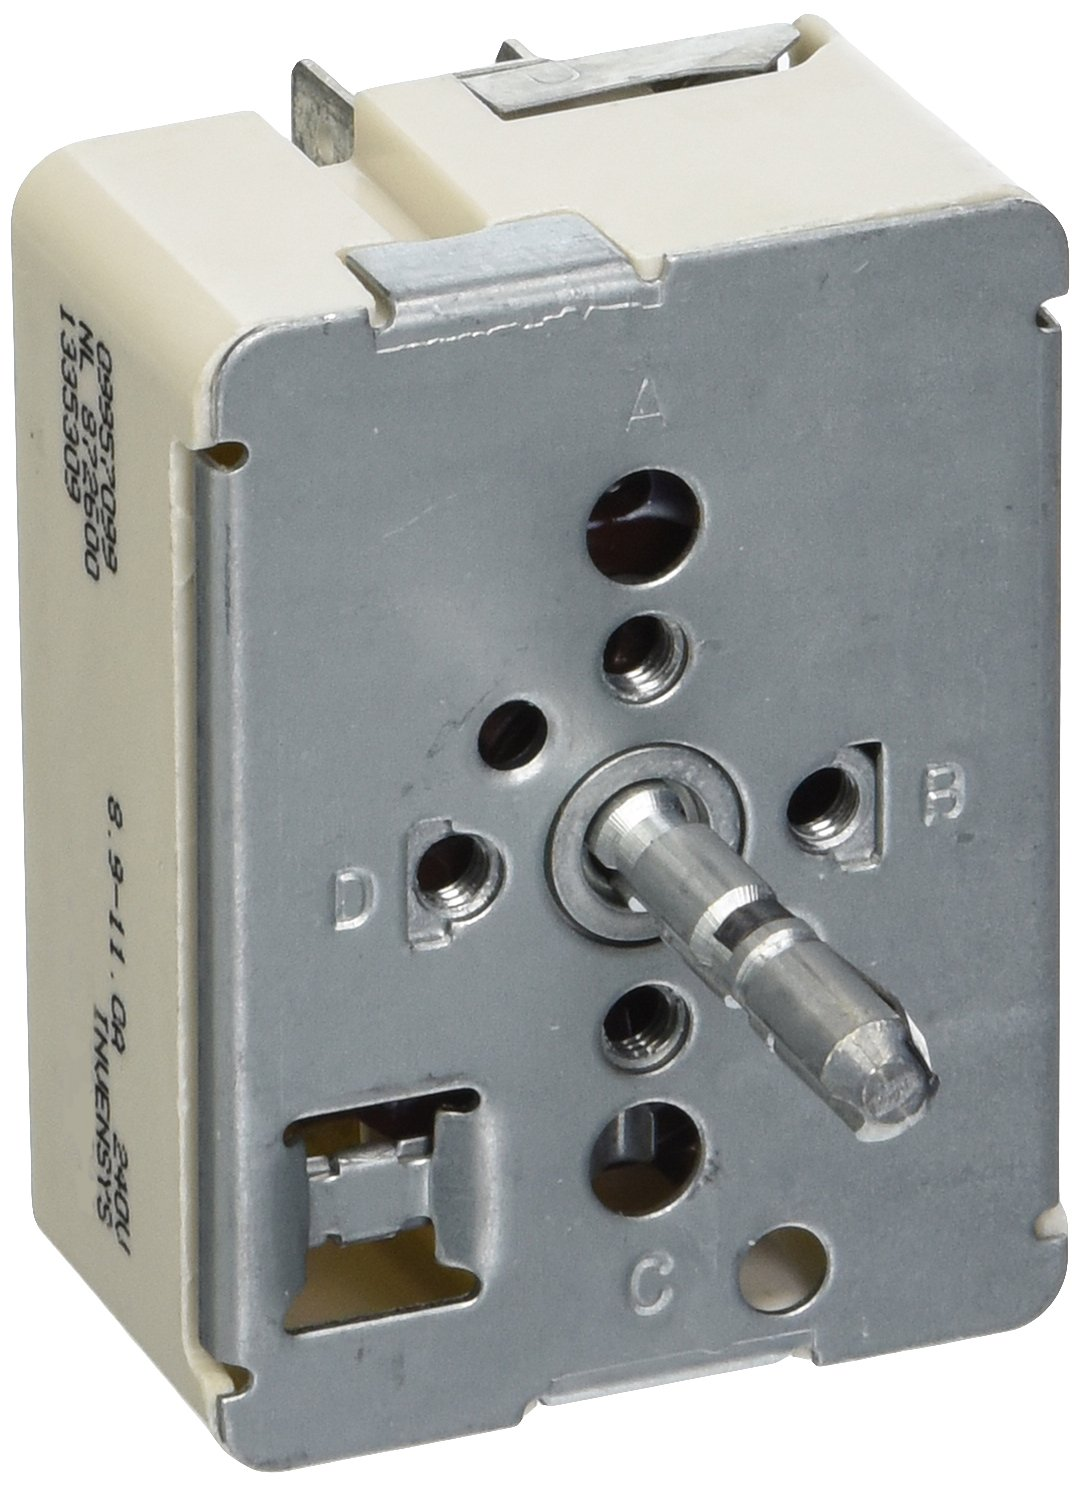 Frigidaire 5309957099 Surface Element Switch Range/Stove/Oven